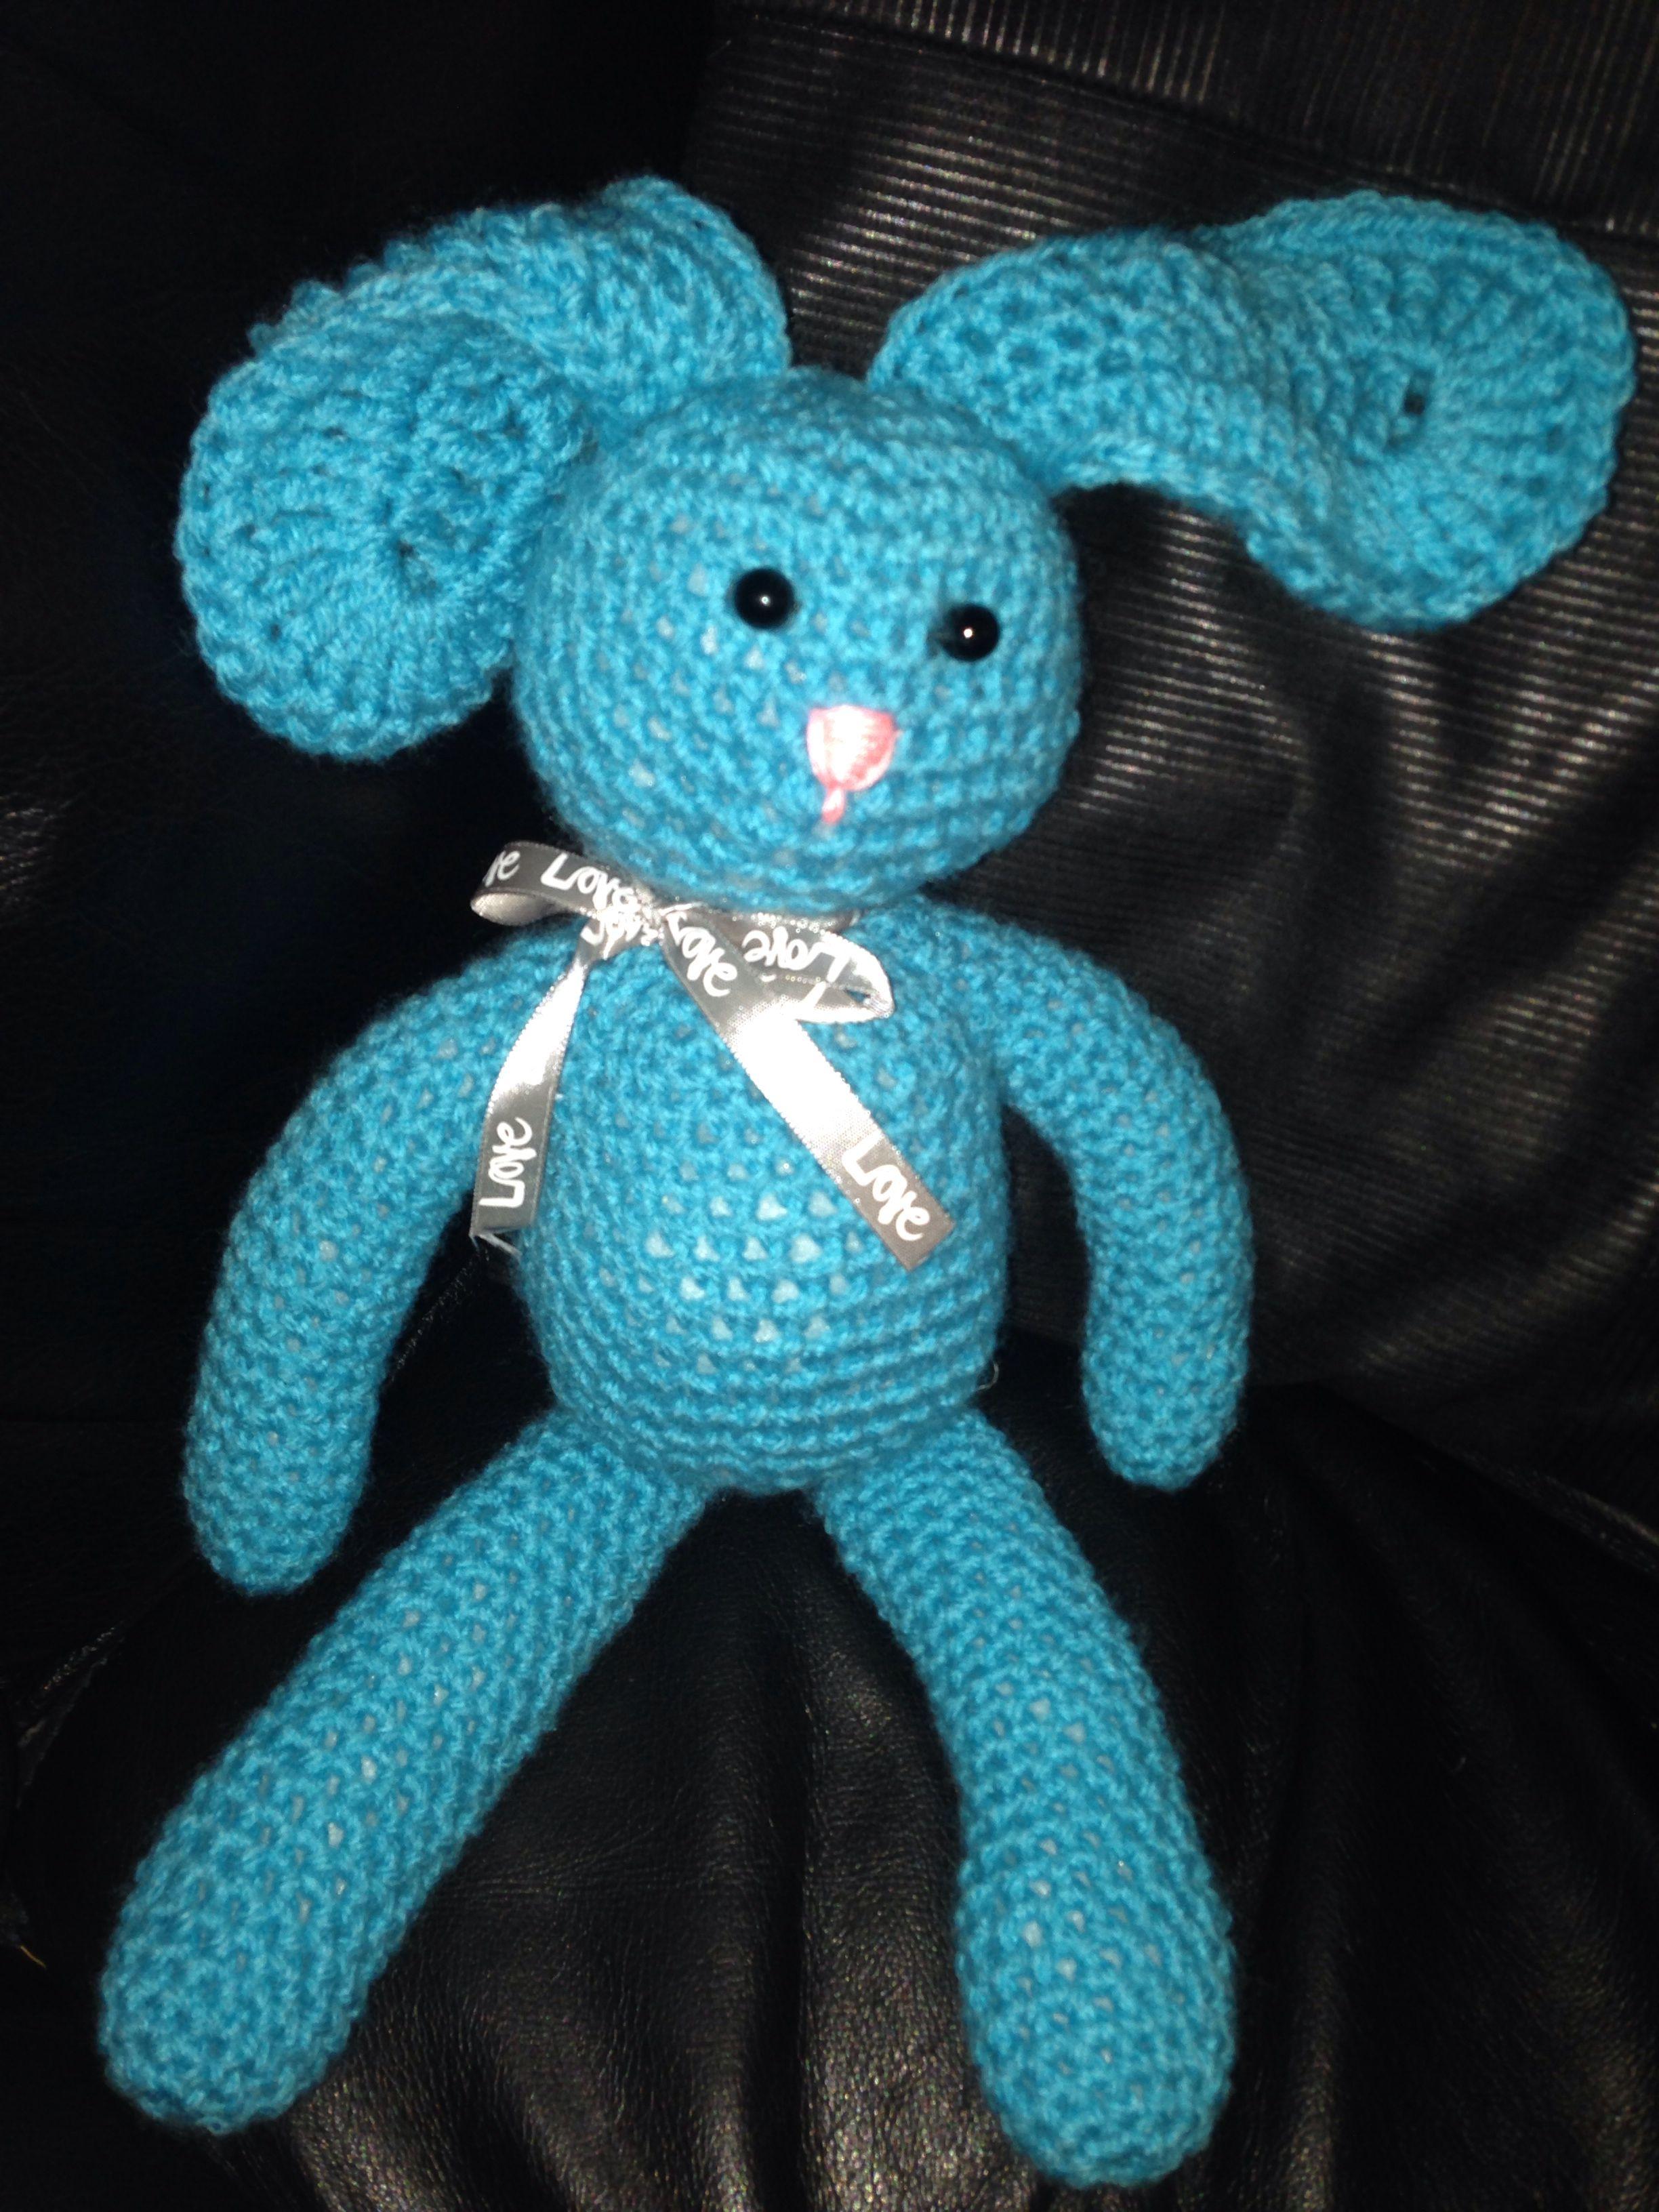 Crochet rabbit I made for a friend. Super cute if I do say so myself!